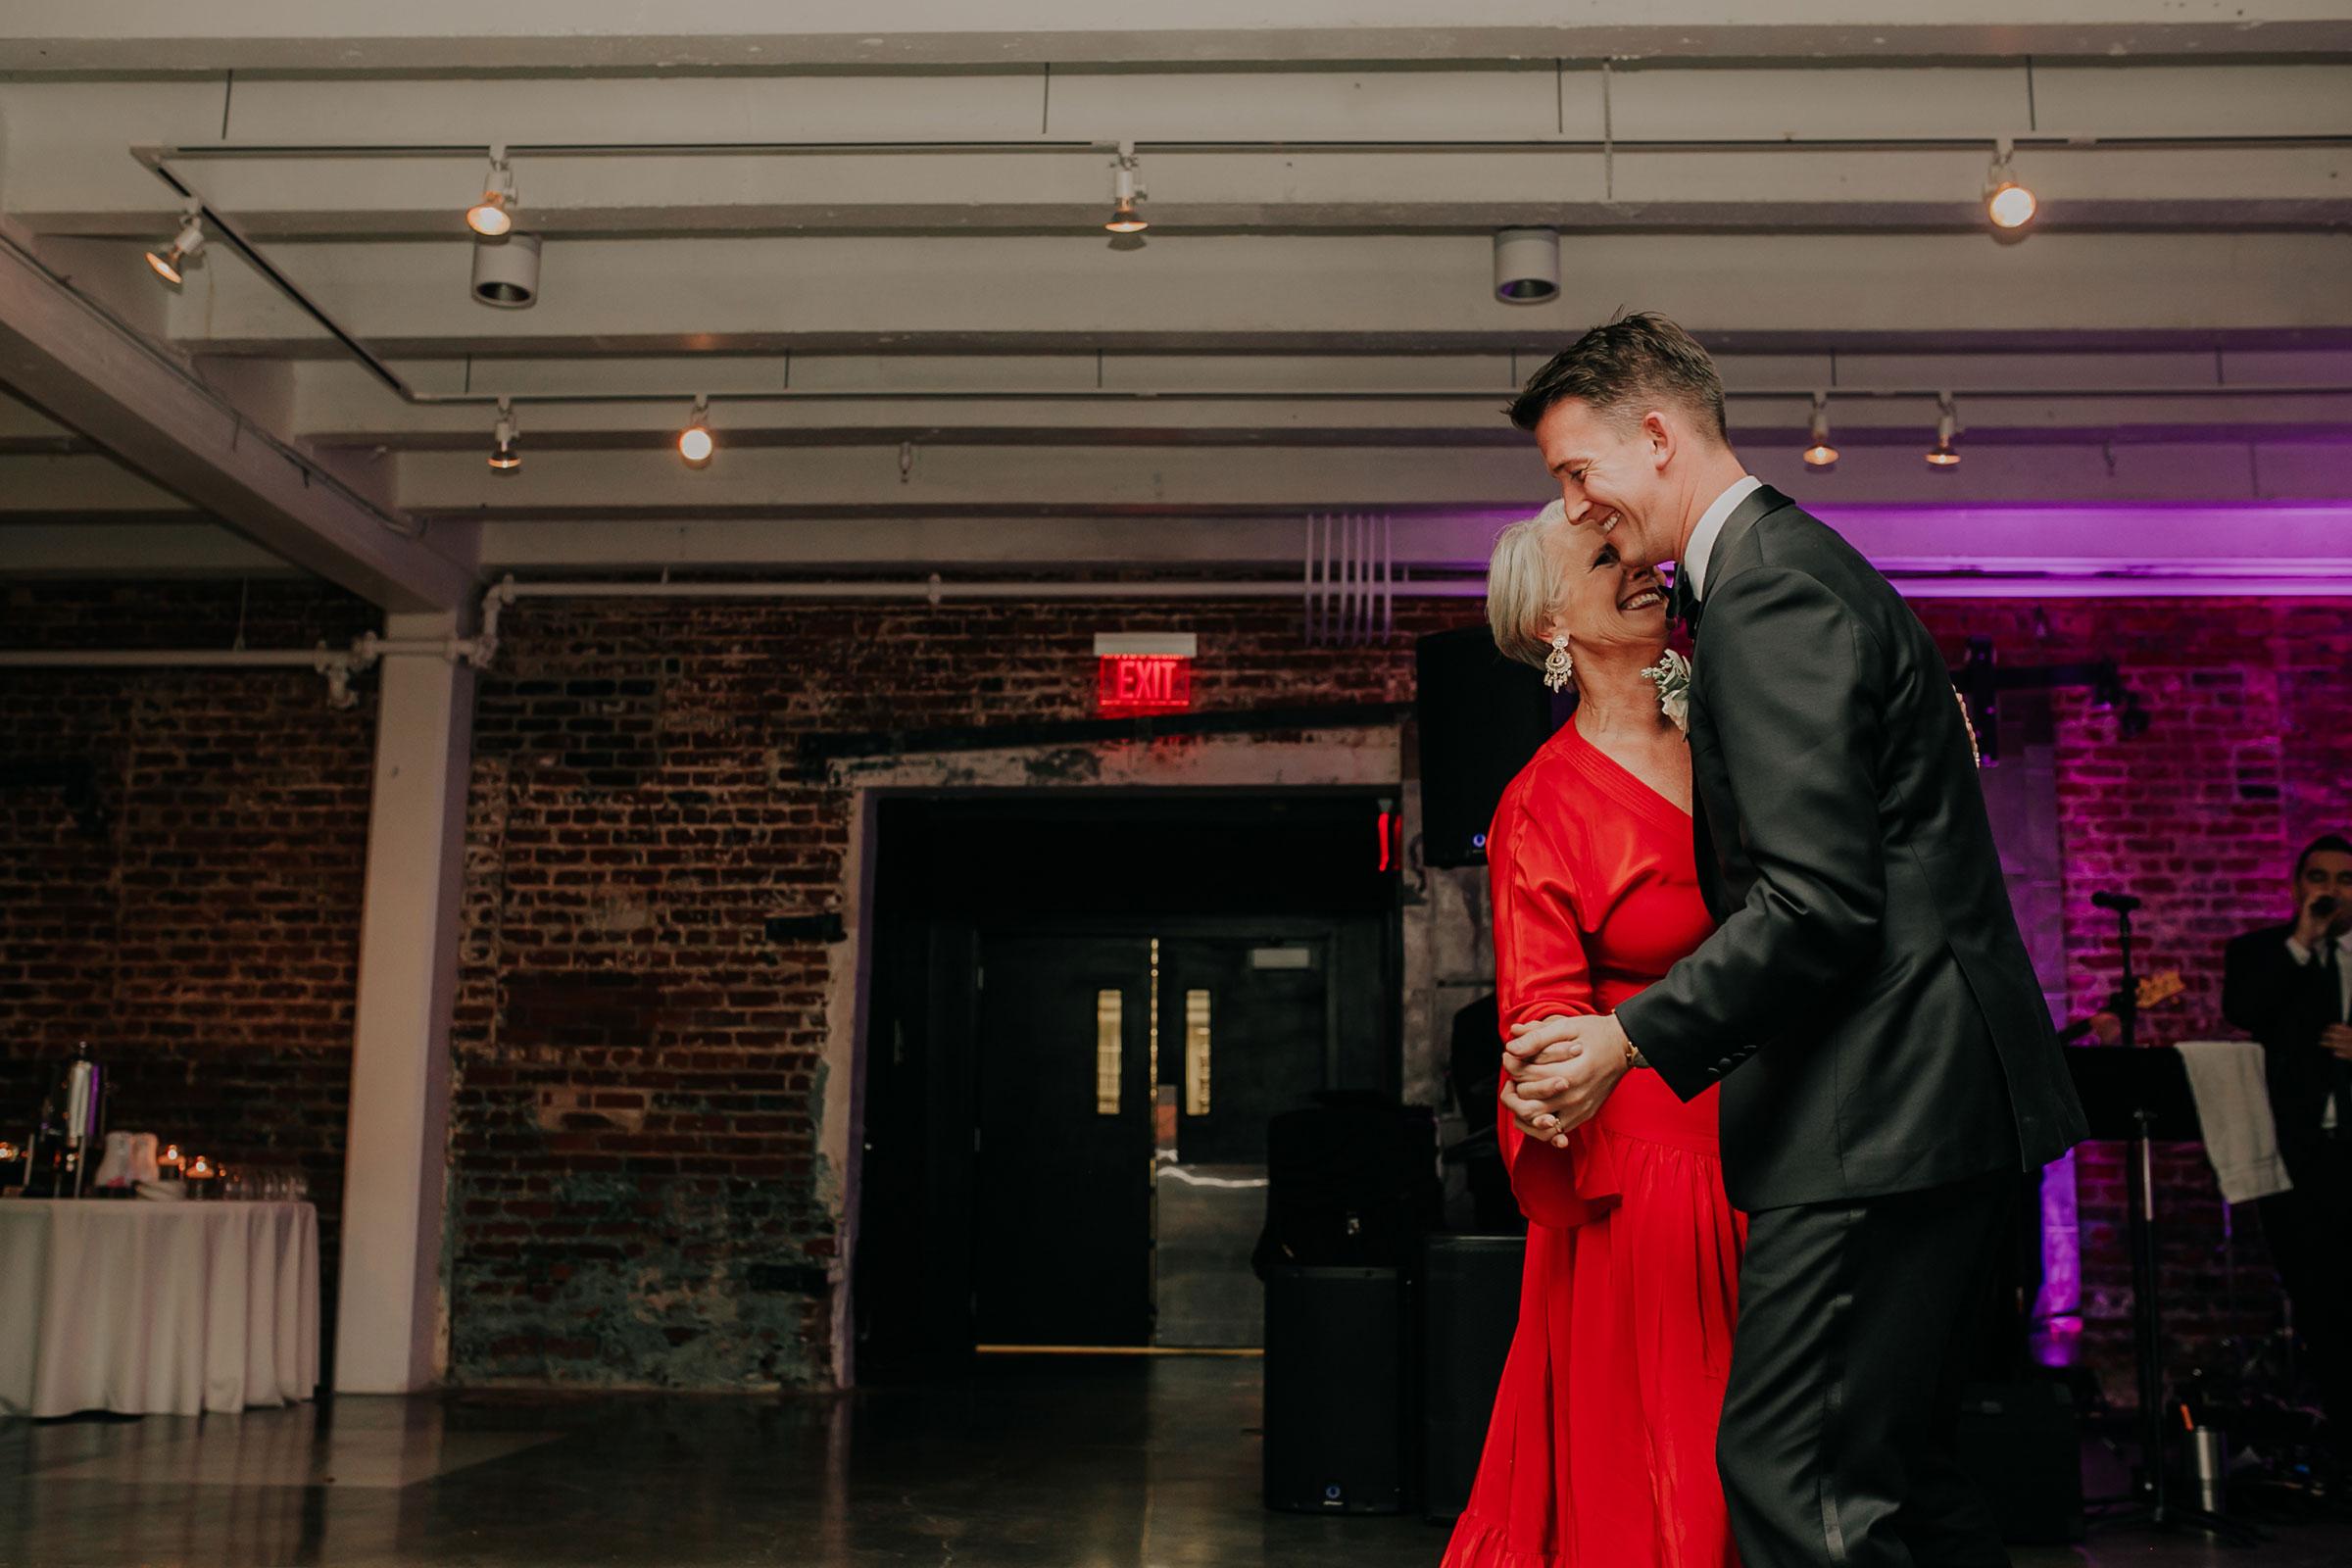 first-dance-with-groom-and-mother-founders-one-nine-omaha-nebraska-raelyn-ramey-photography.jpg